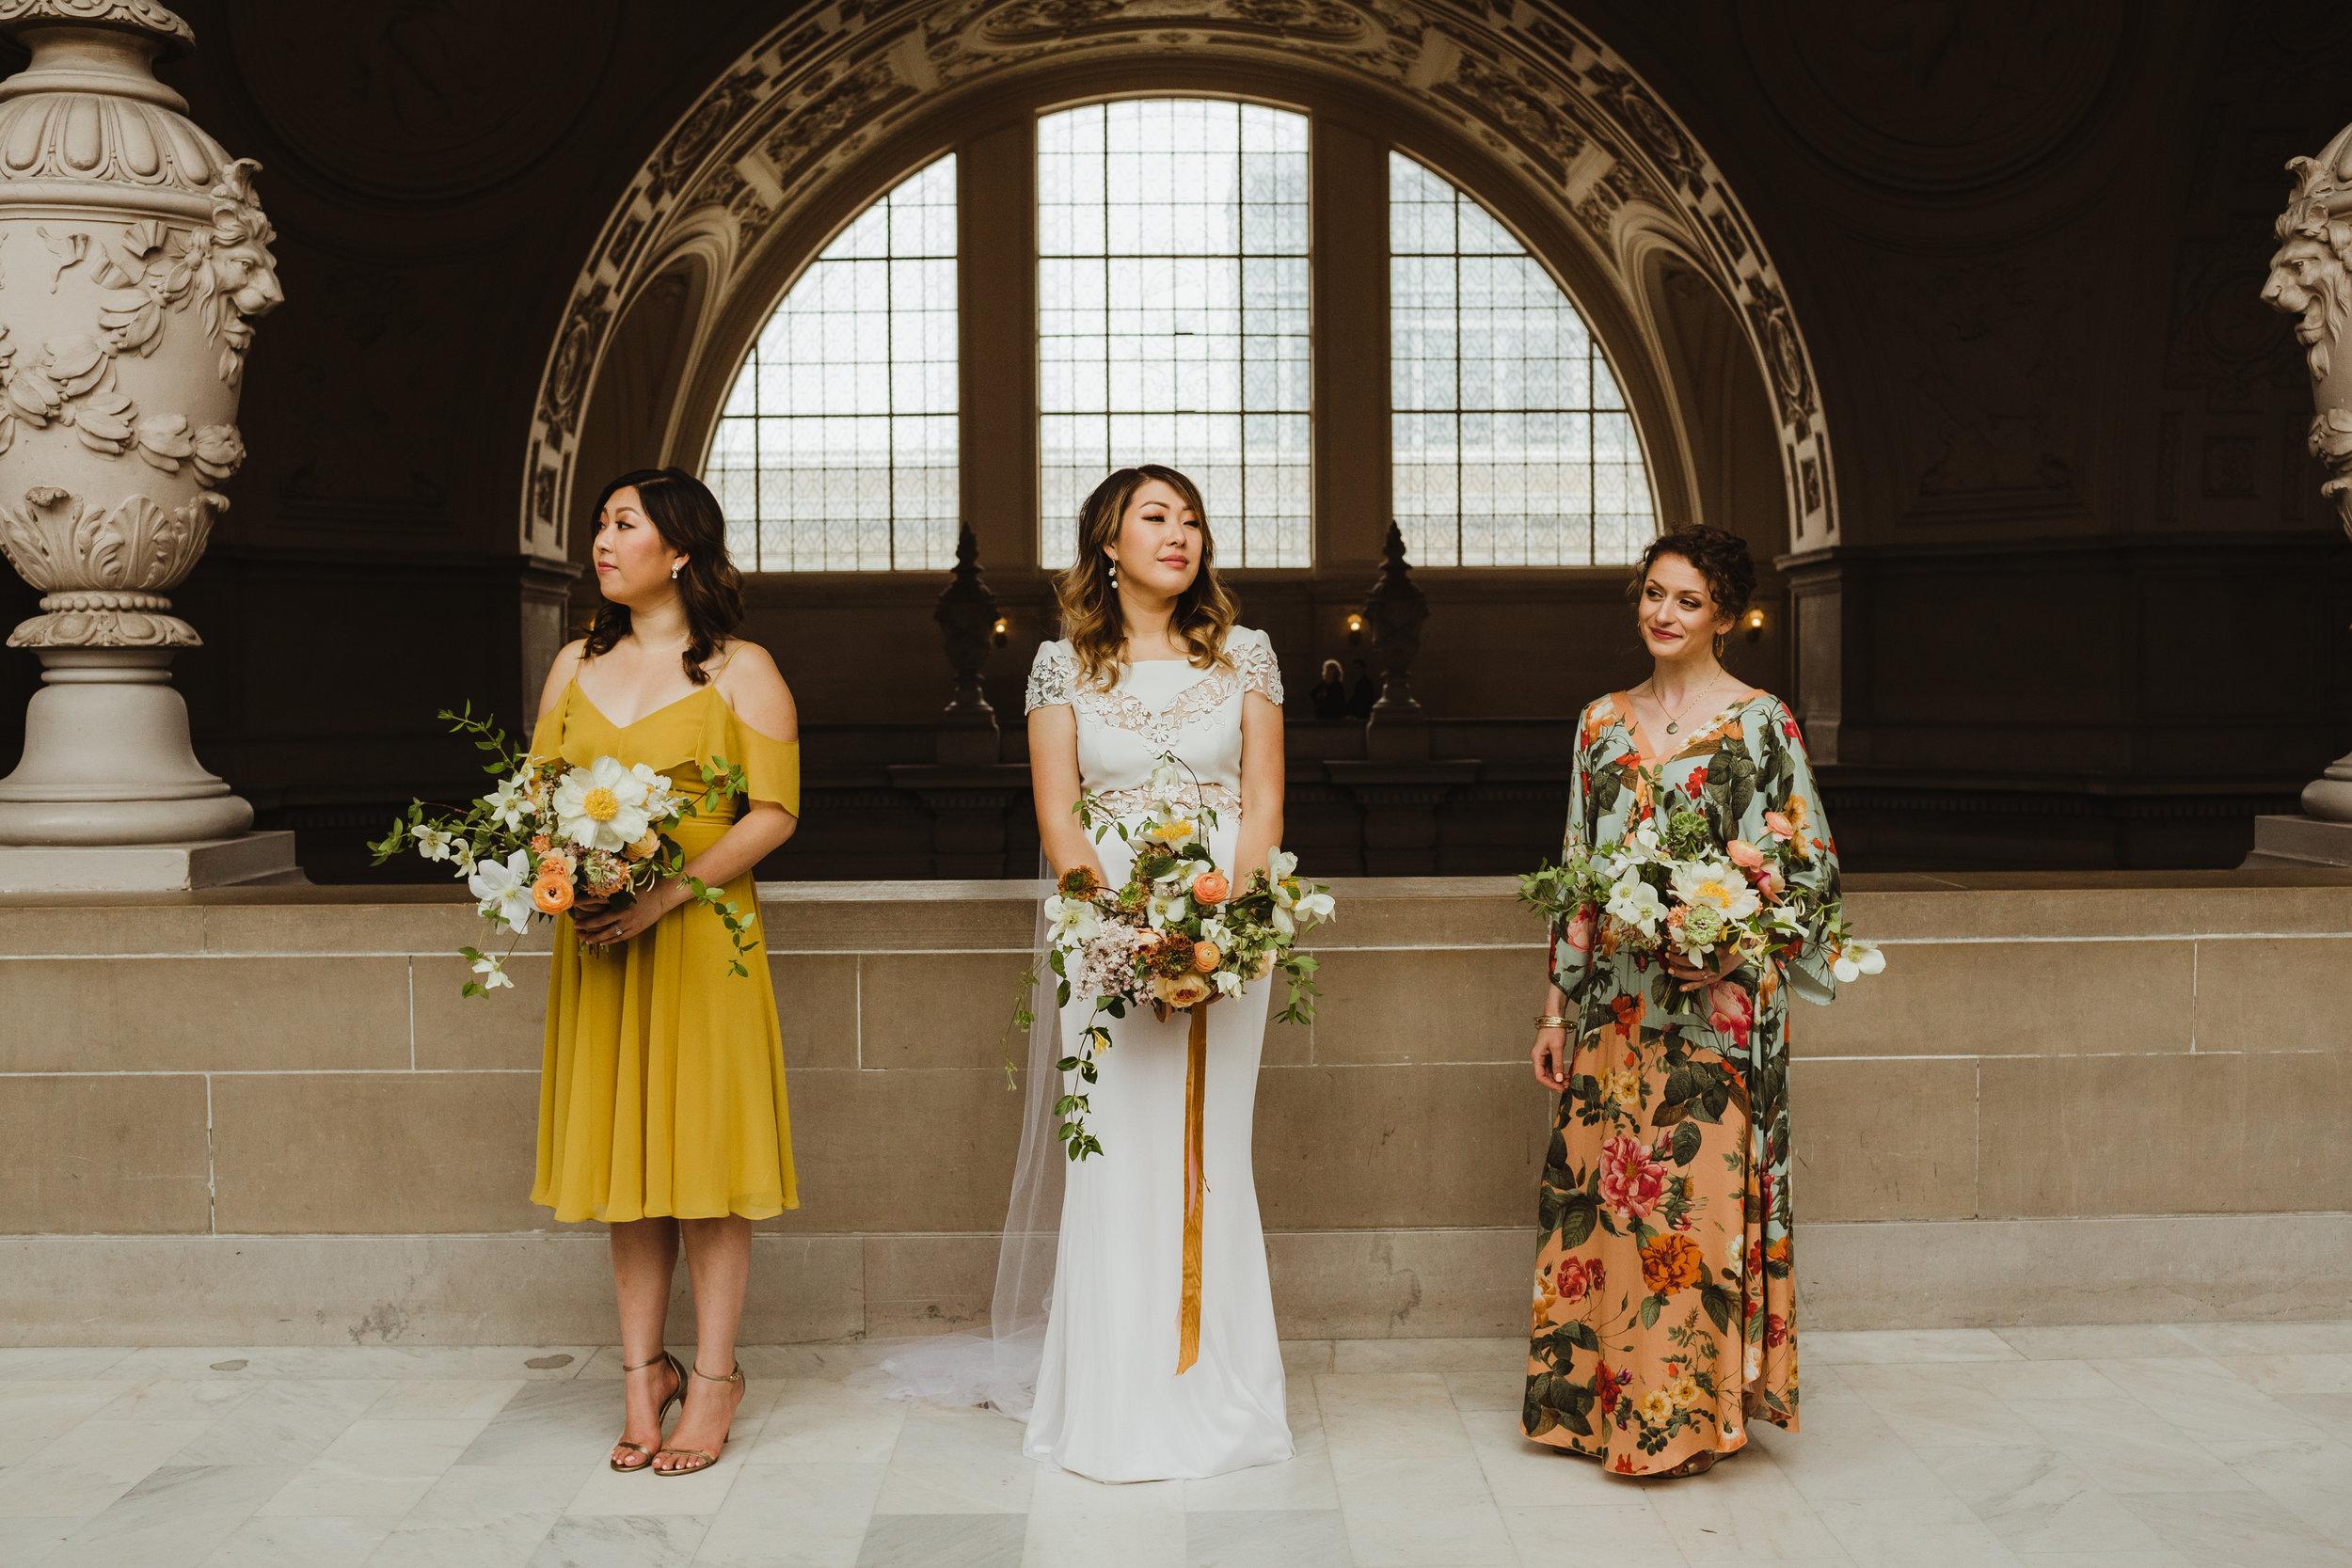 San Francisco City Hall Wedding Photography by Hannah Costello